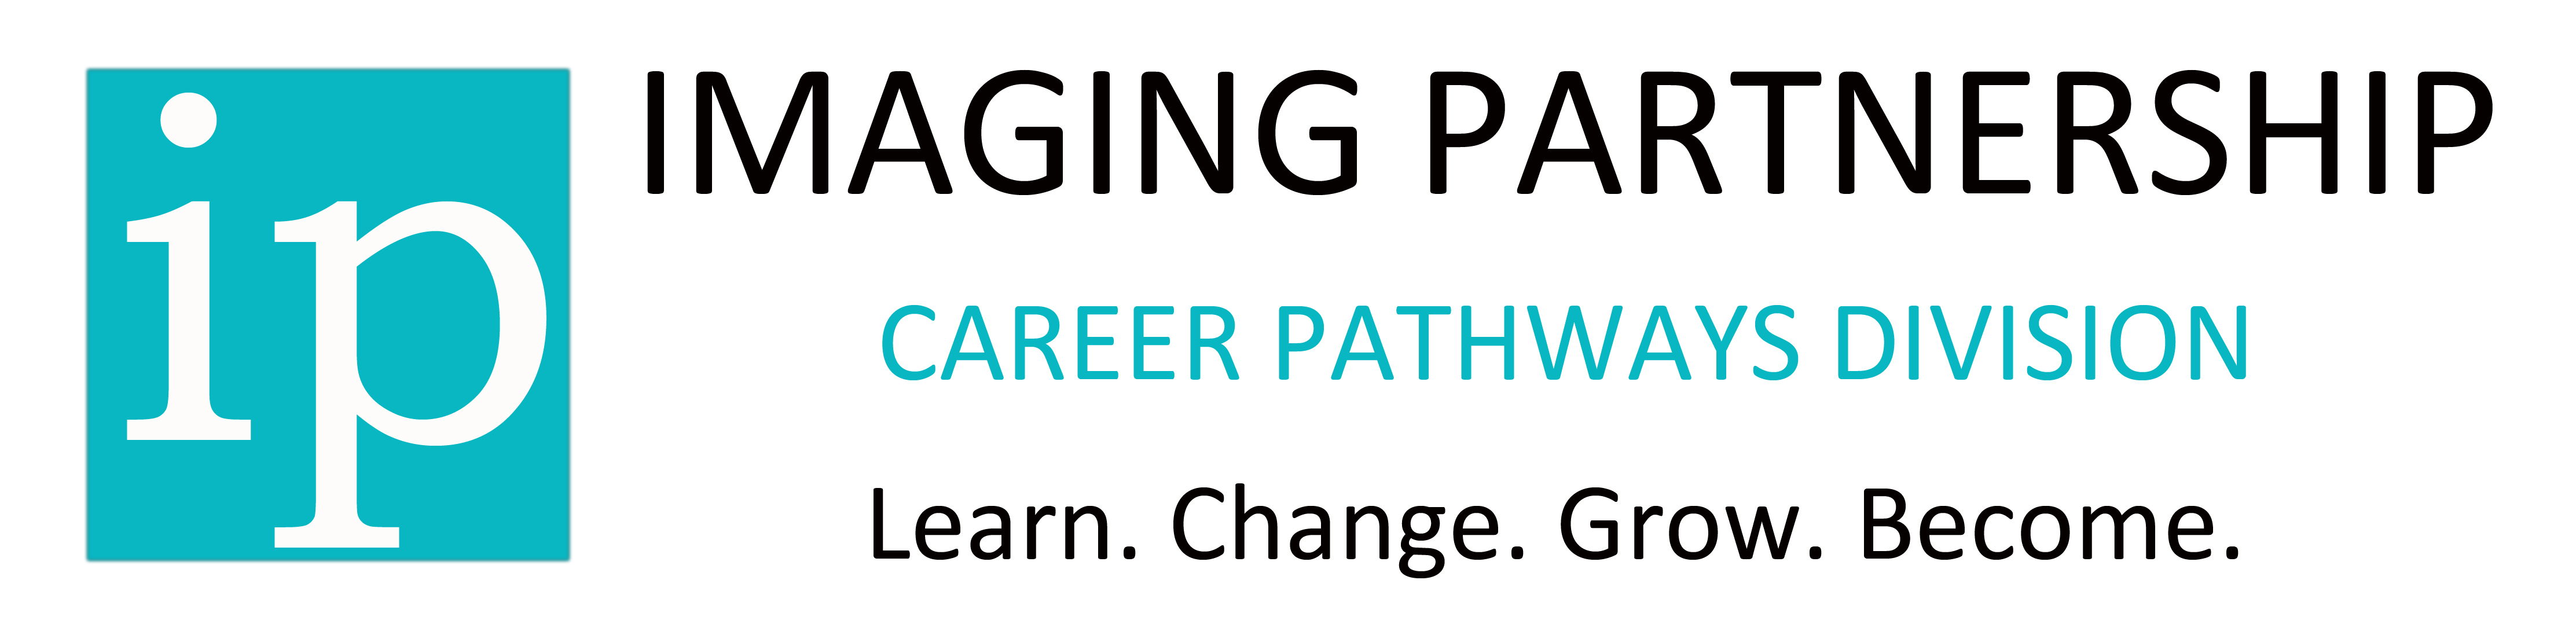 Career Pathways Division